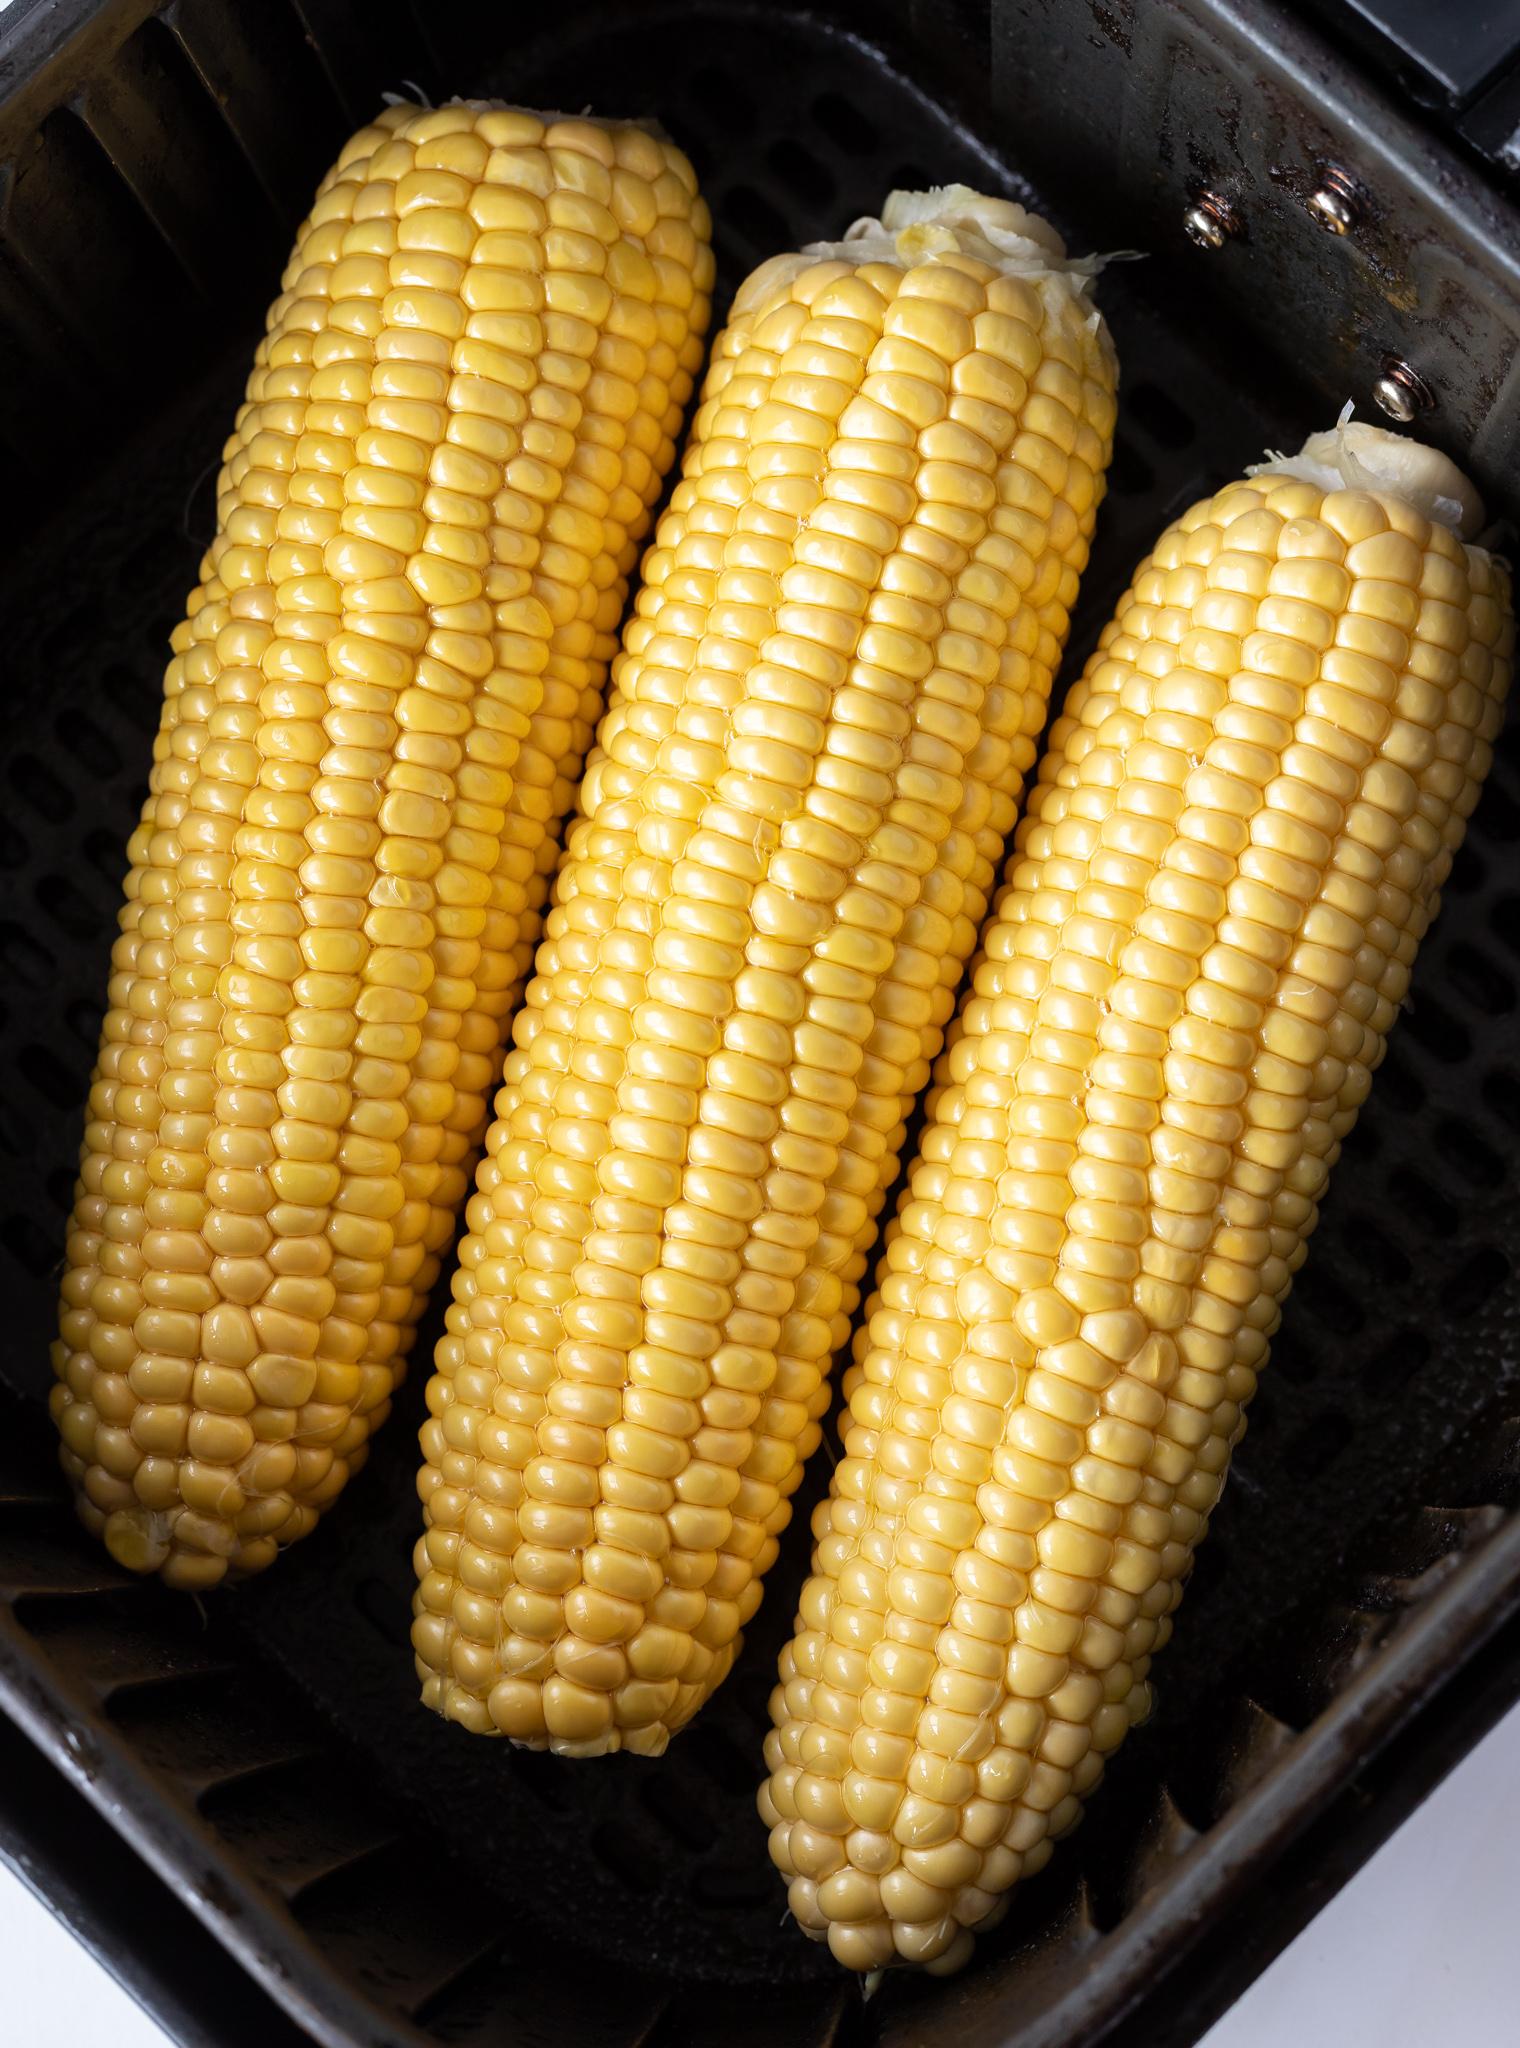 raw corn cobs in air fryer basket